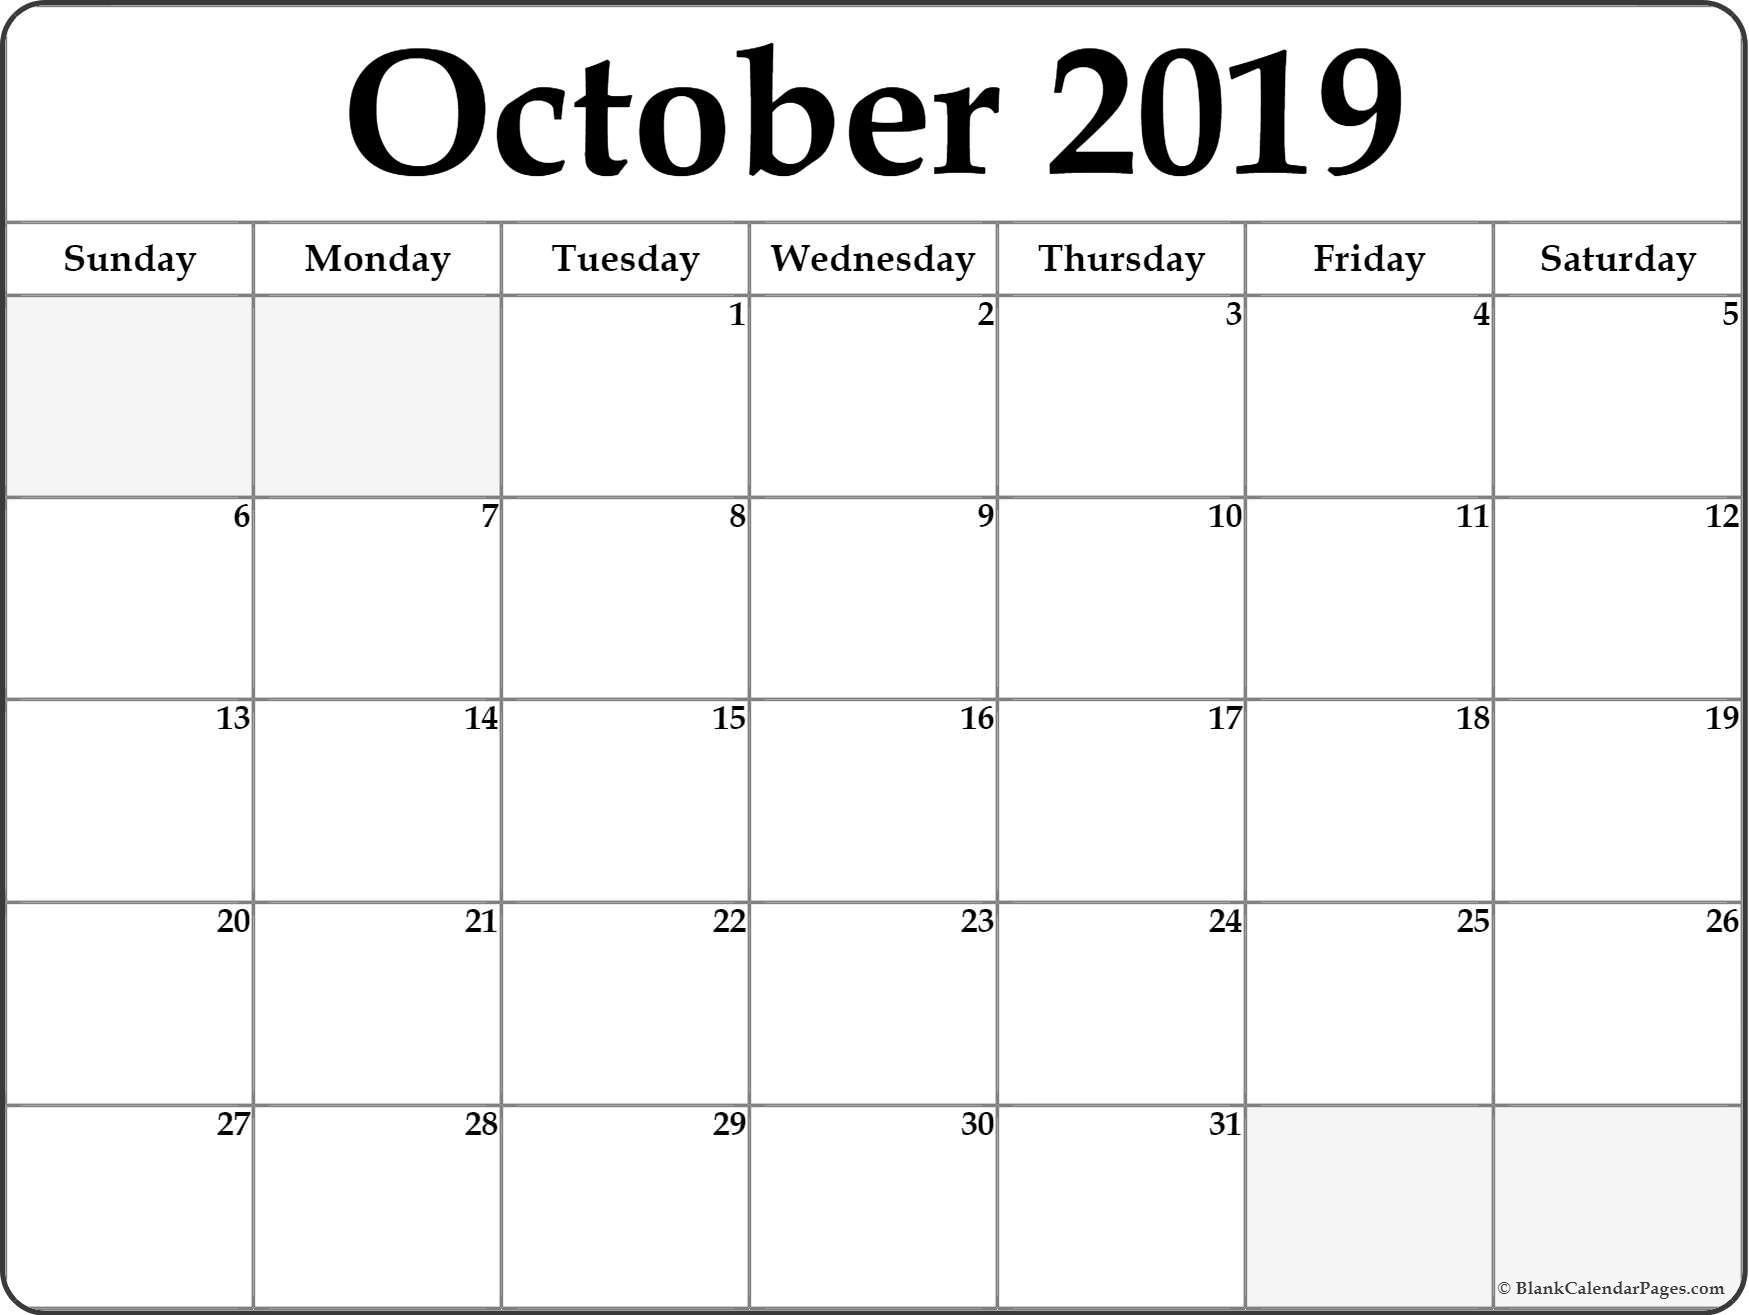 October 2019 Blank Calendar Printable Blank Calendar Calendar